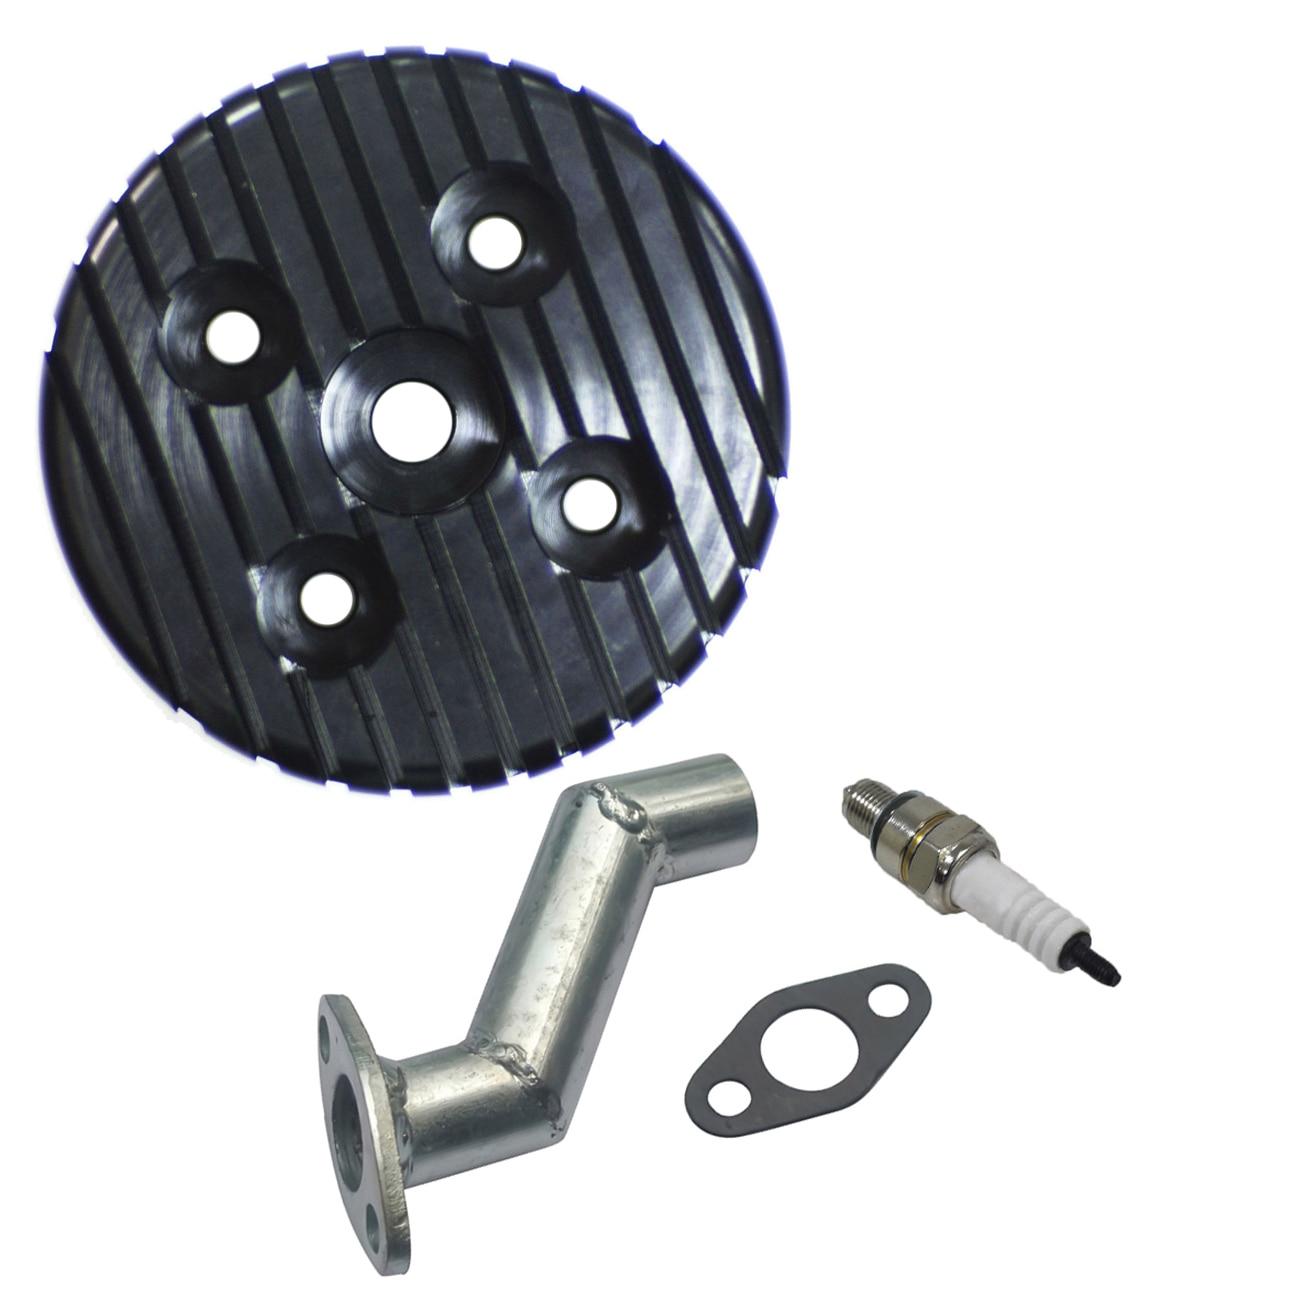 CNC Cylinder Head & Intake Manifold & Spark Plug For 80cc Motorized Bike